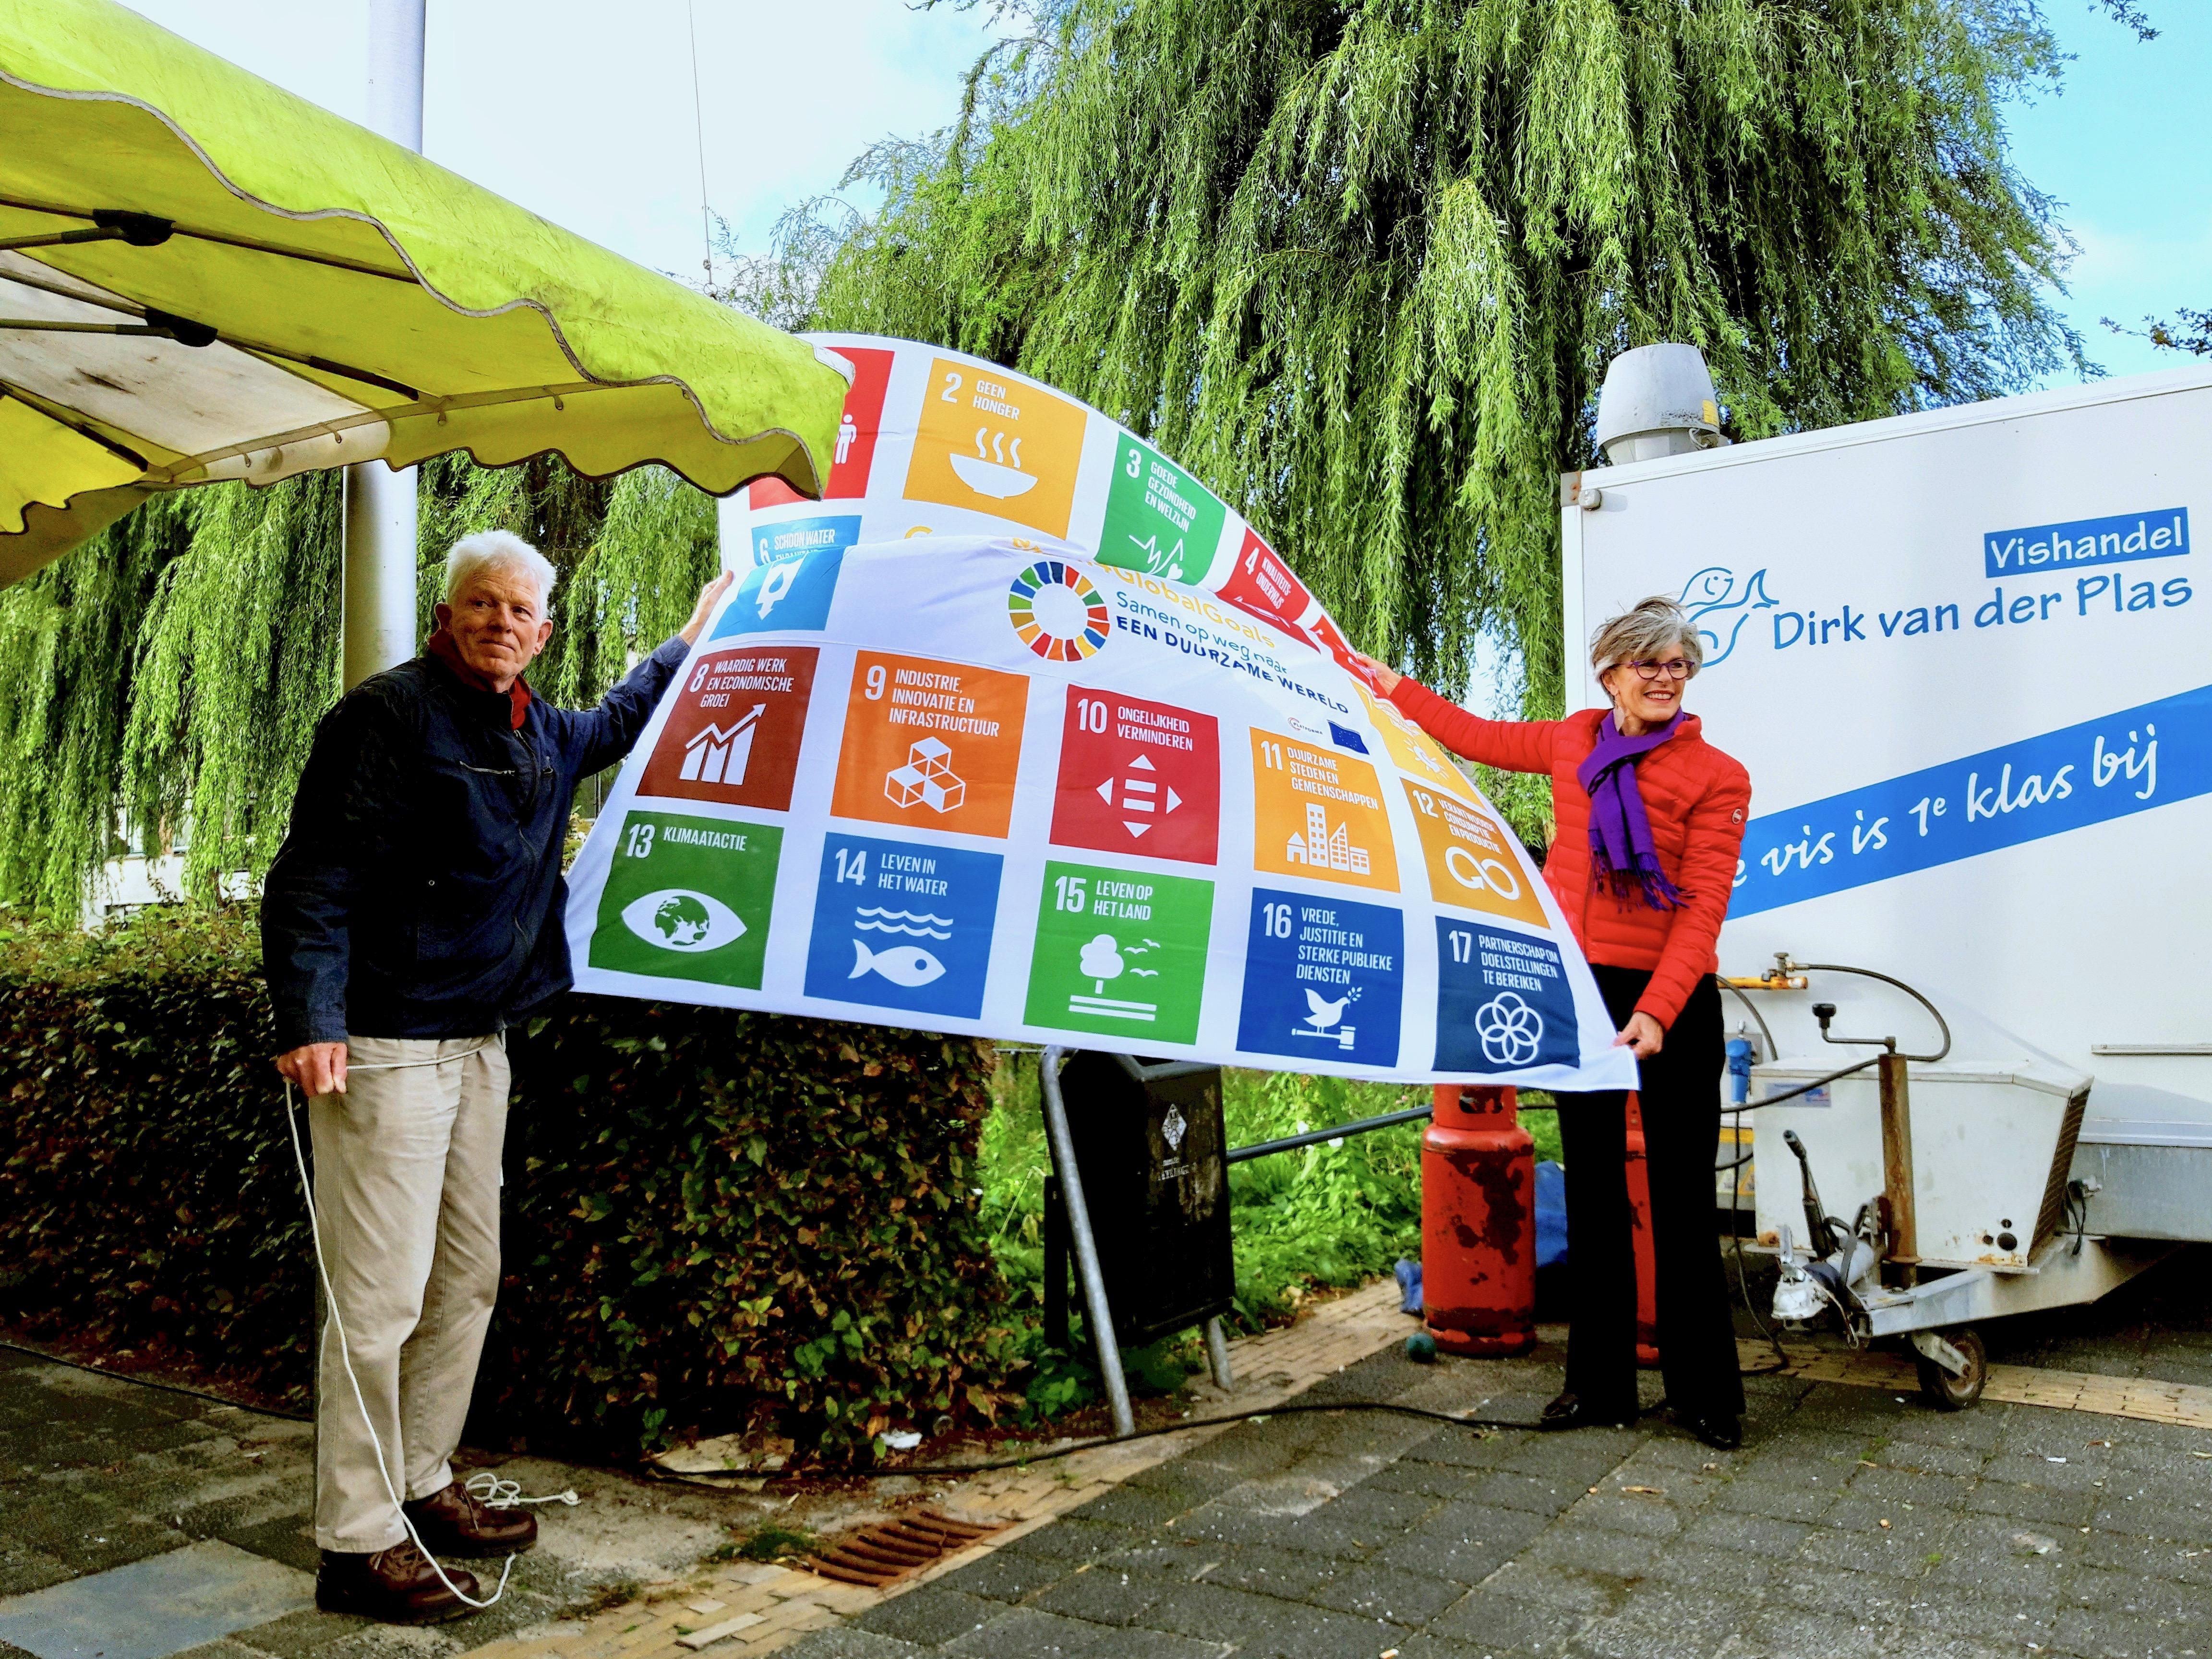 Teylingen hijst de VN-ontwikkelingsvlag